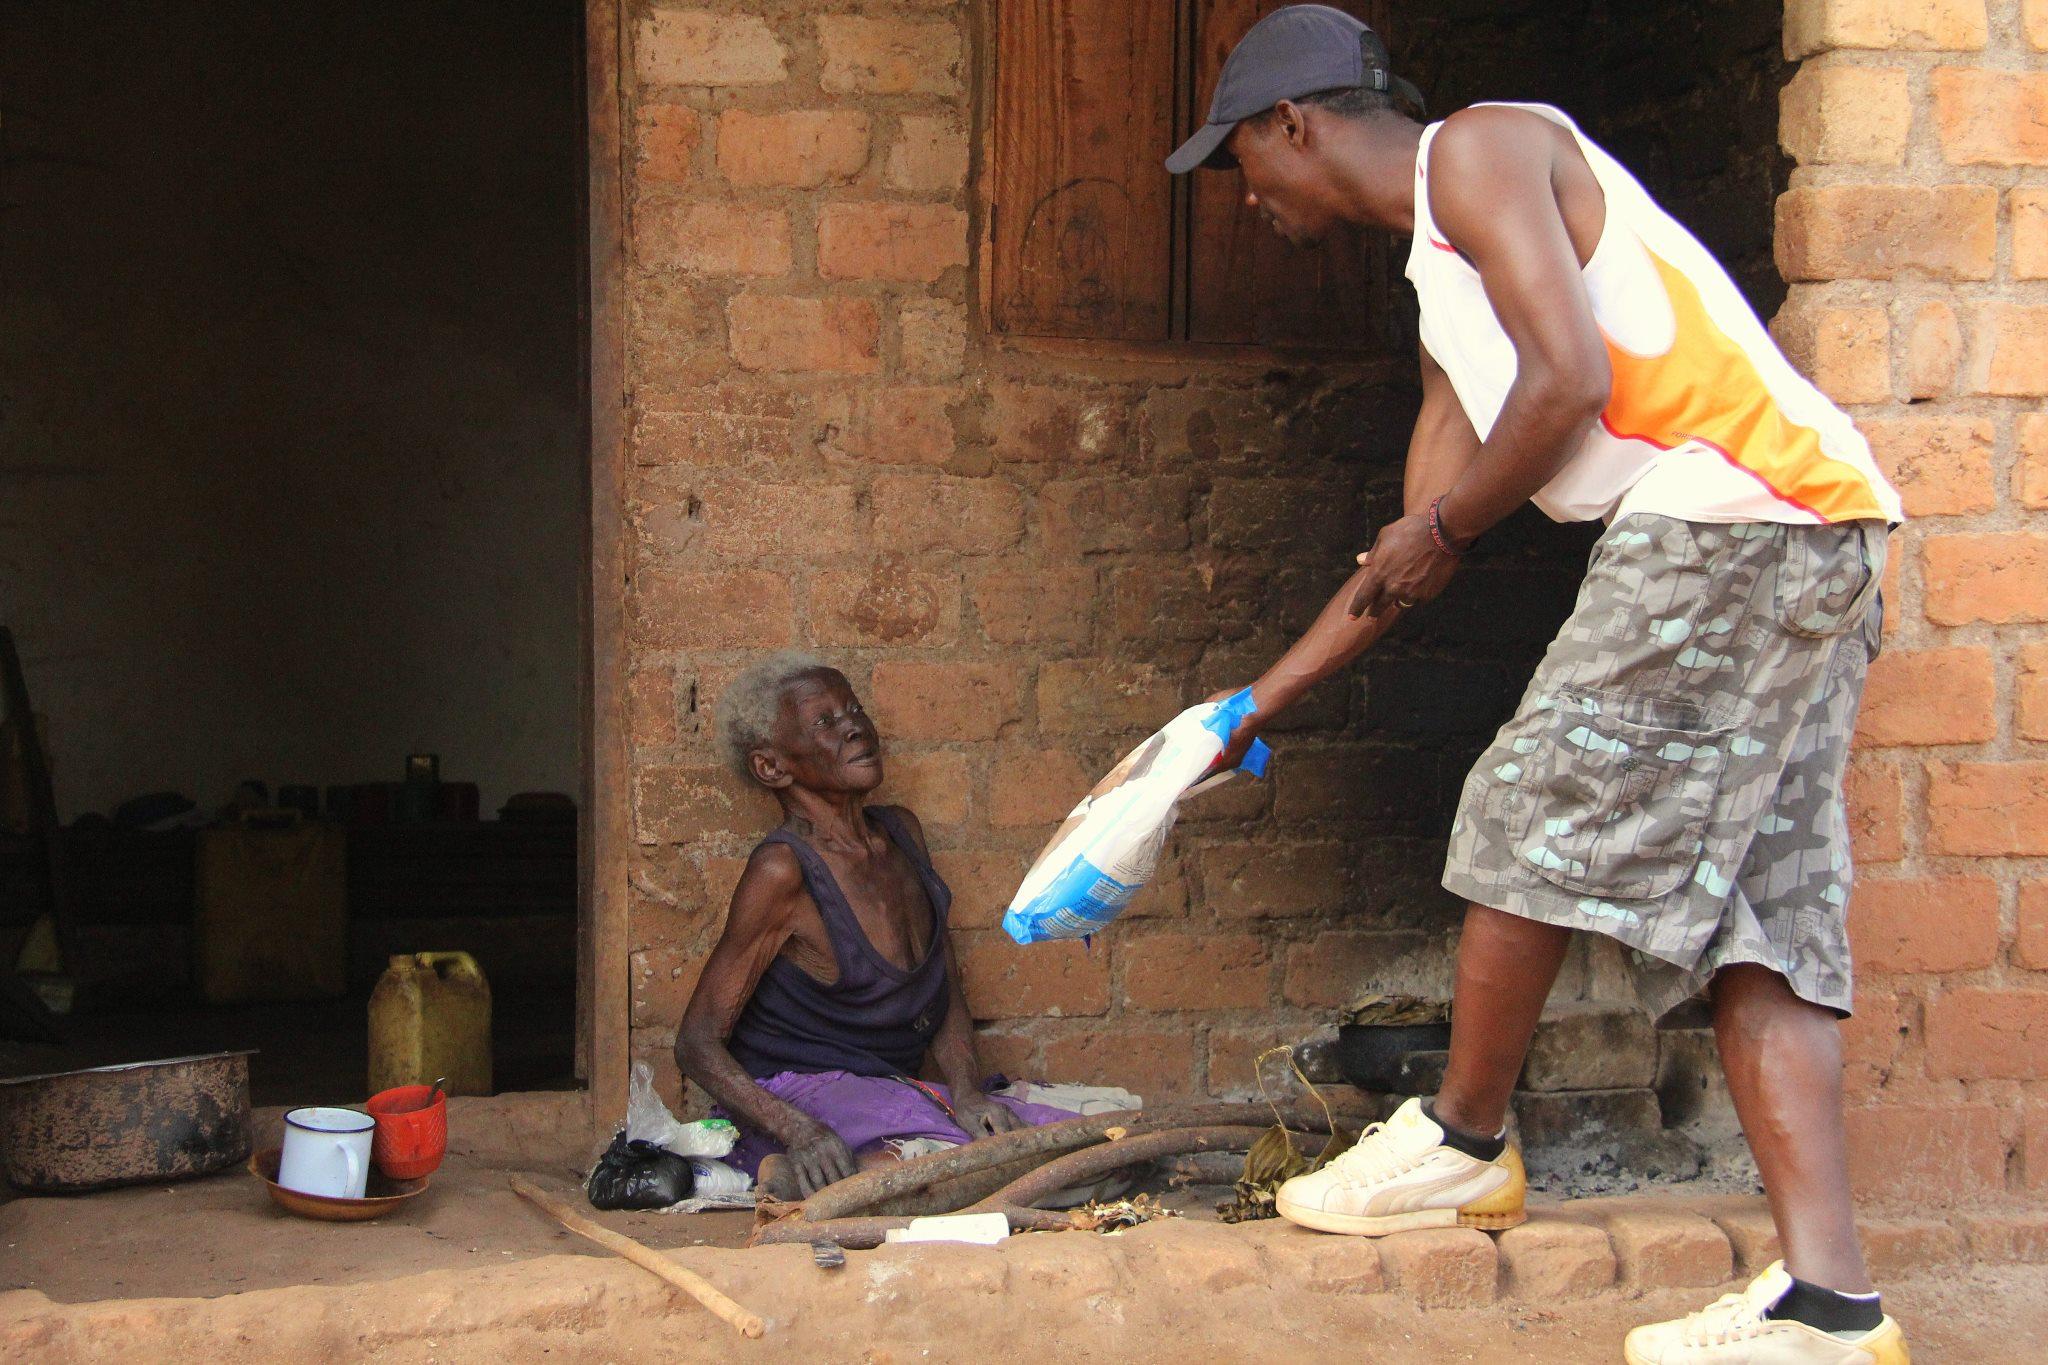 Director Of Ugandan Affairs: Godfrey Mugisha hands out malaria nets in Mpigi, Uganda